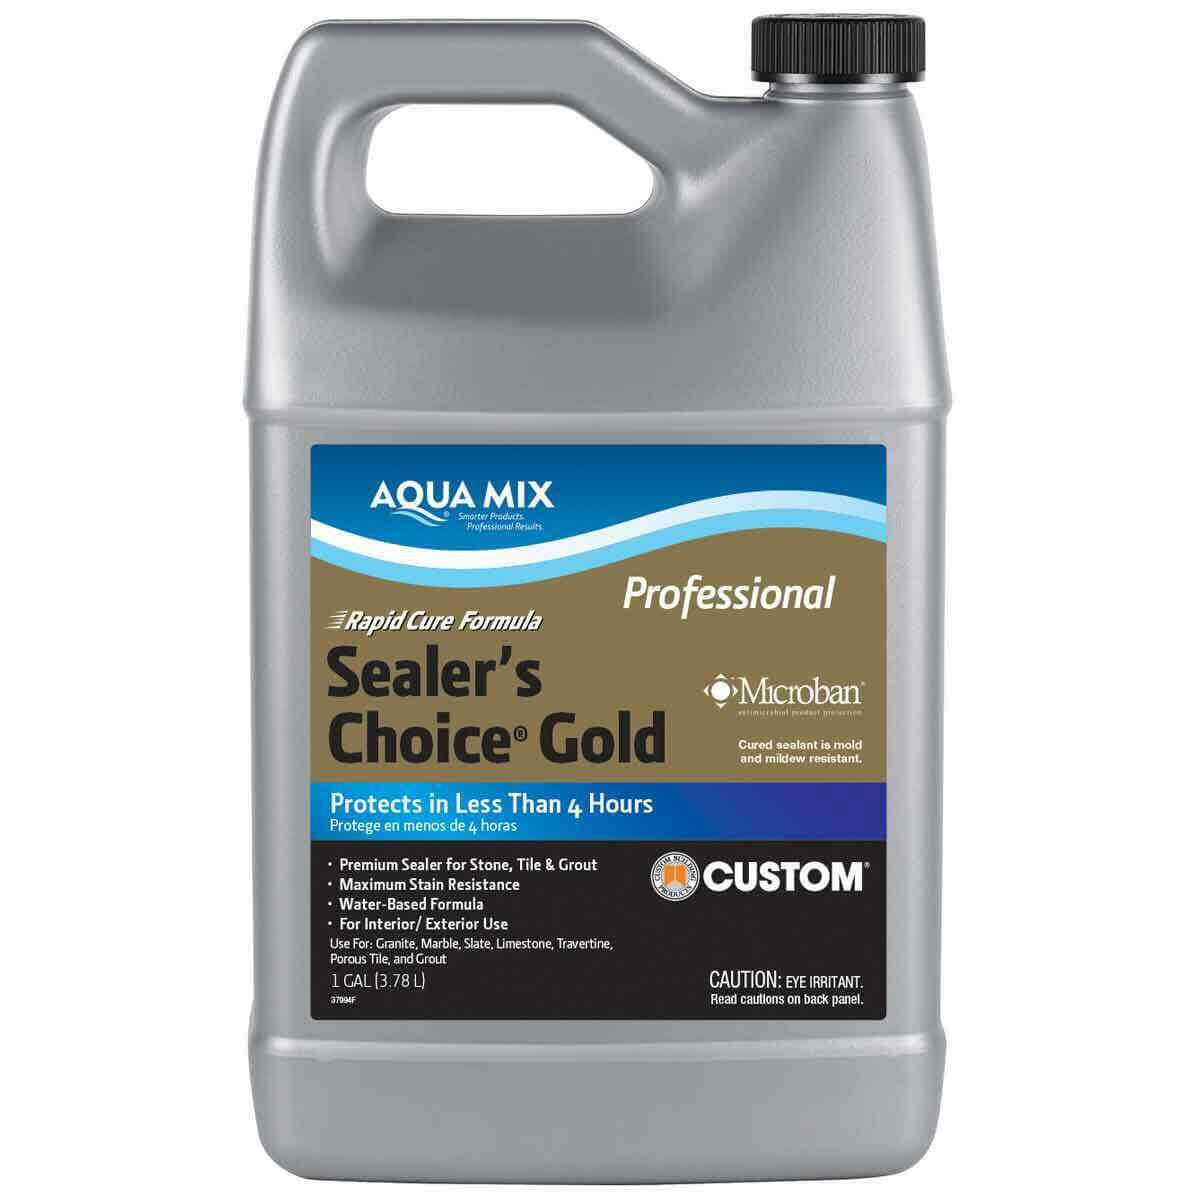 1 Gallon Aqua Mix Sealer's Choice Gold Penetrating Sealer 030883